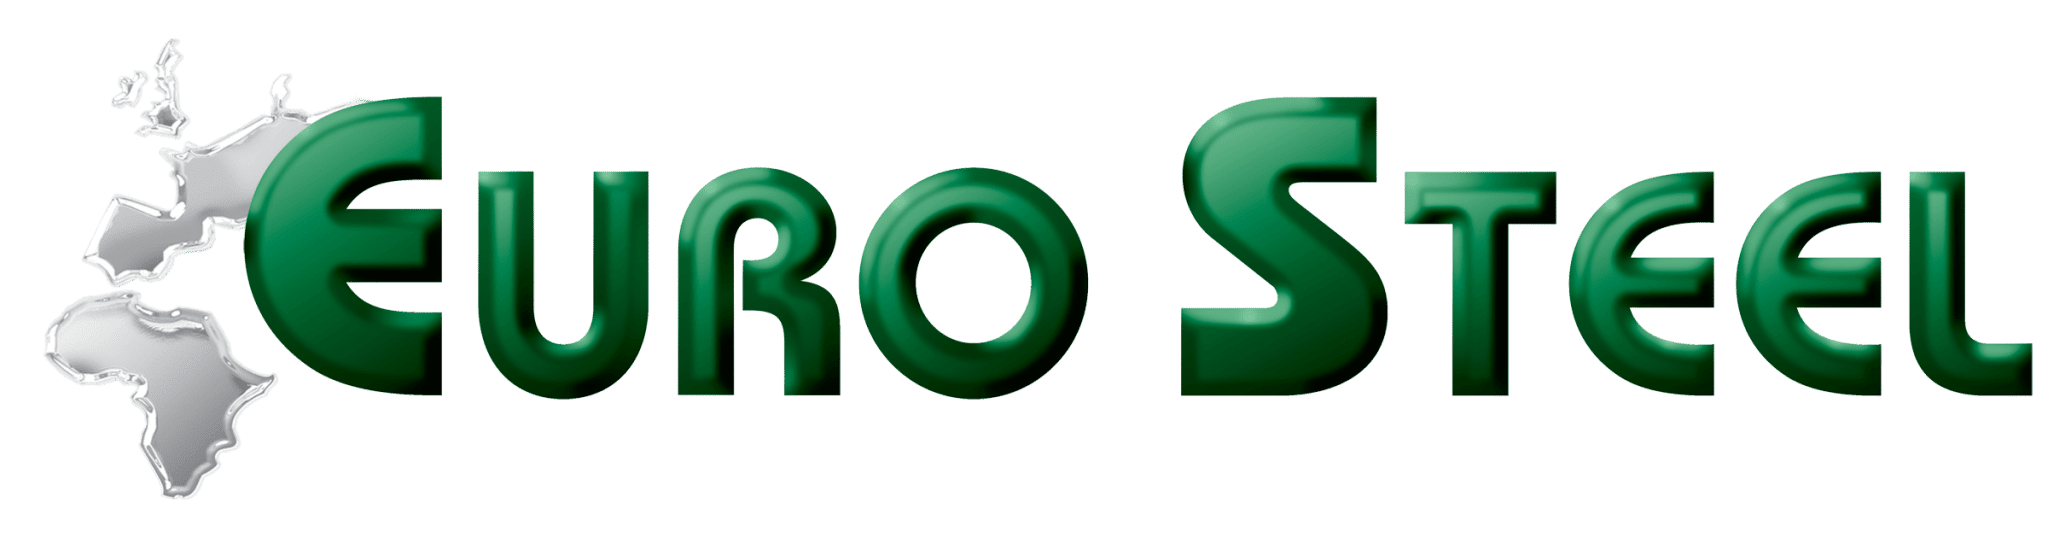 Eurosteel Group company logo